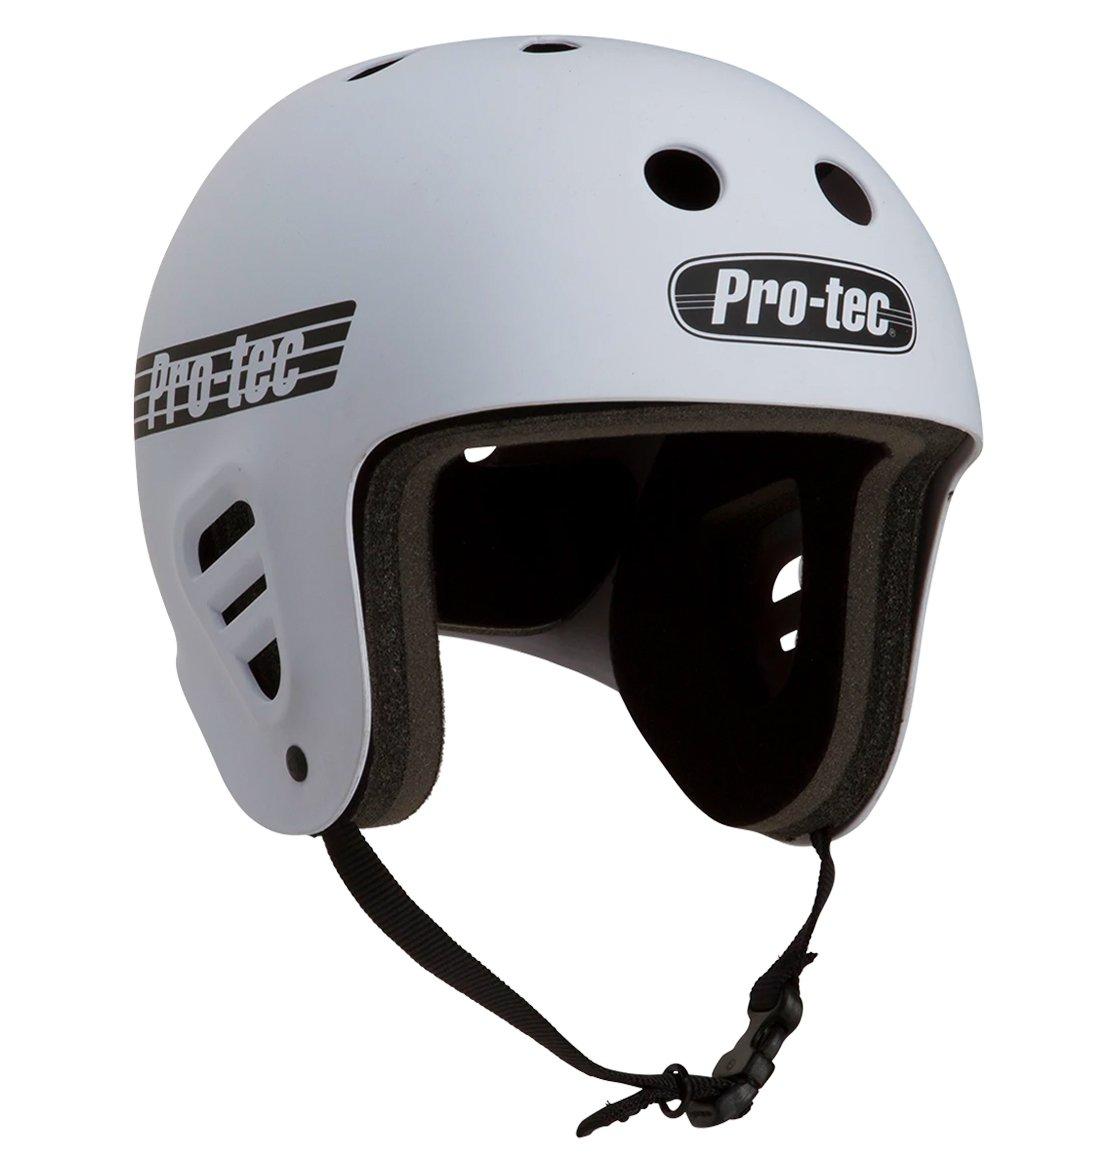 Pro-Tec Full Cut Skate Helmet (Multiple Color Options)